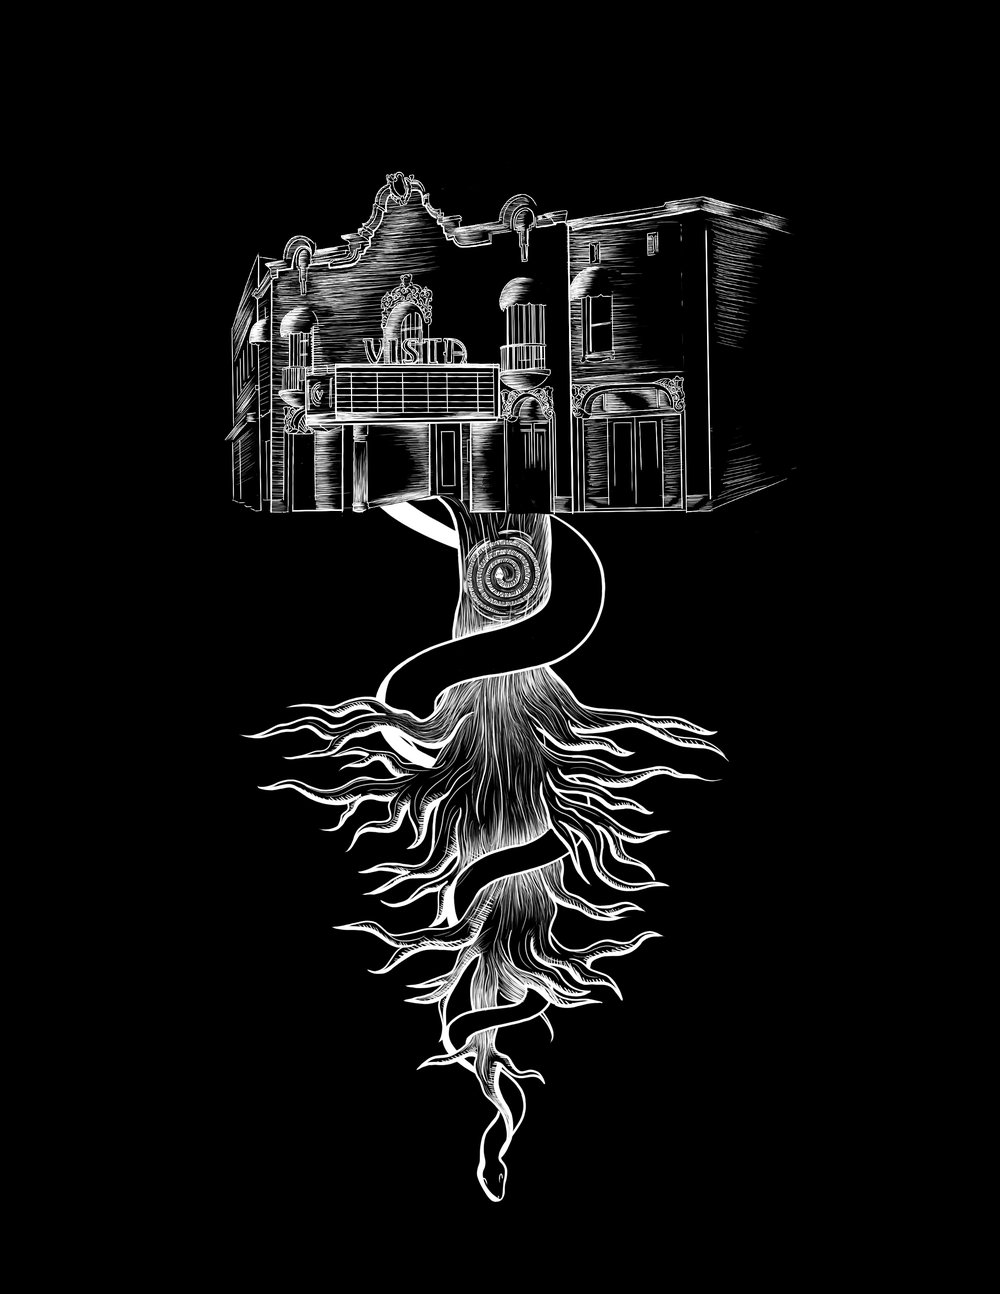 Hulu_Halloween_Shadows_Projectionist_WE_v02.jpg